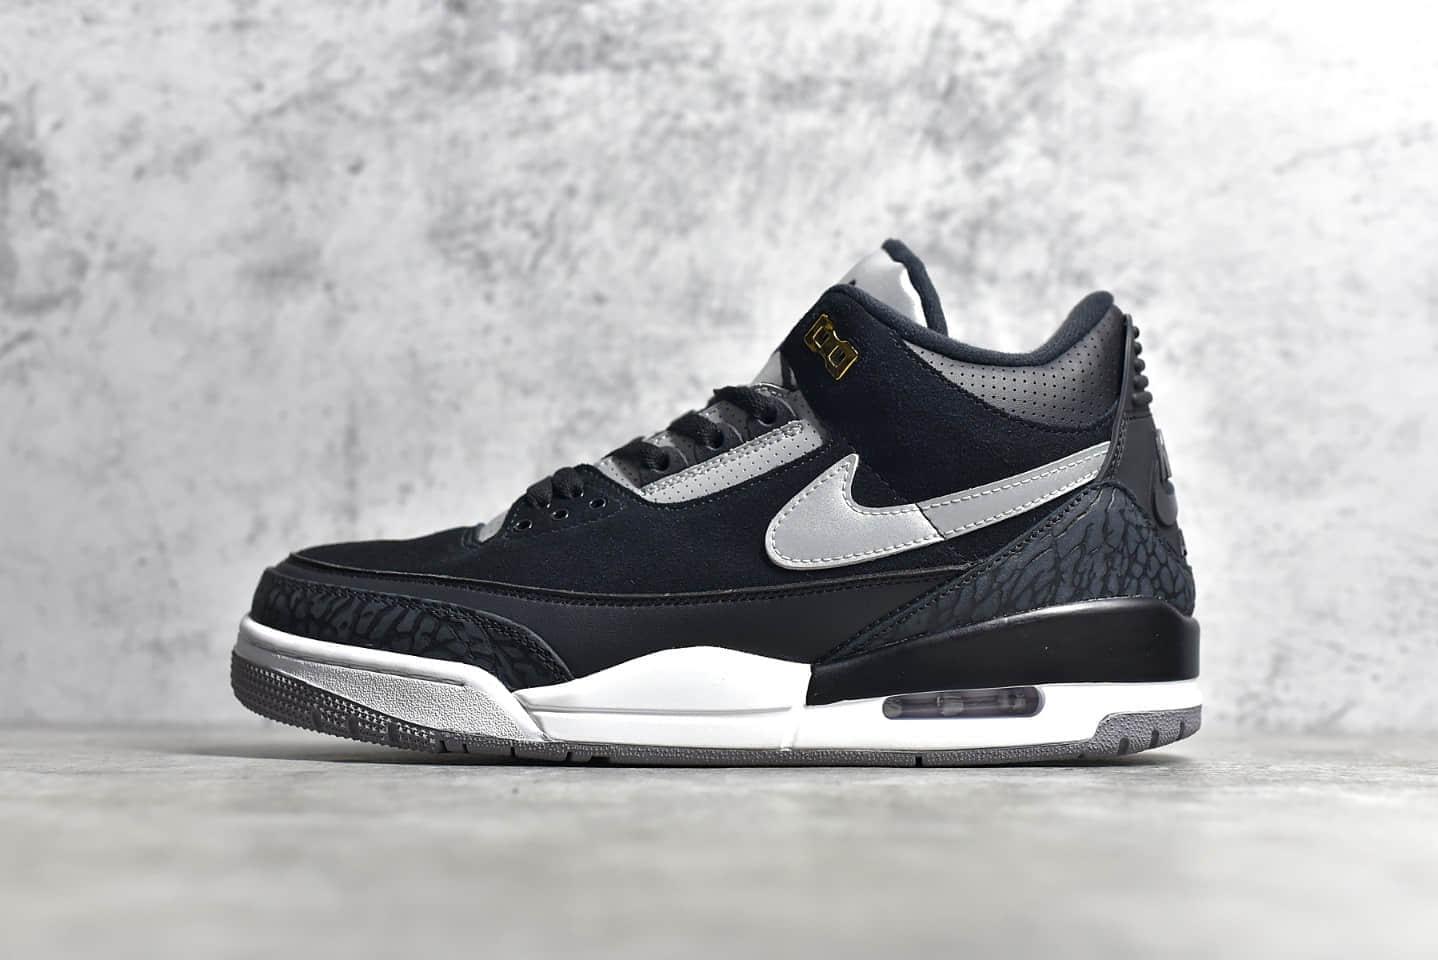 AJ3黑水泥反光 Air Jordan 3 Retro Tinker 纯原版本AJ3黑色绒面皮实战球鞋 货号:CK4348-007-潮流者之家